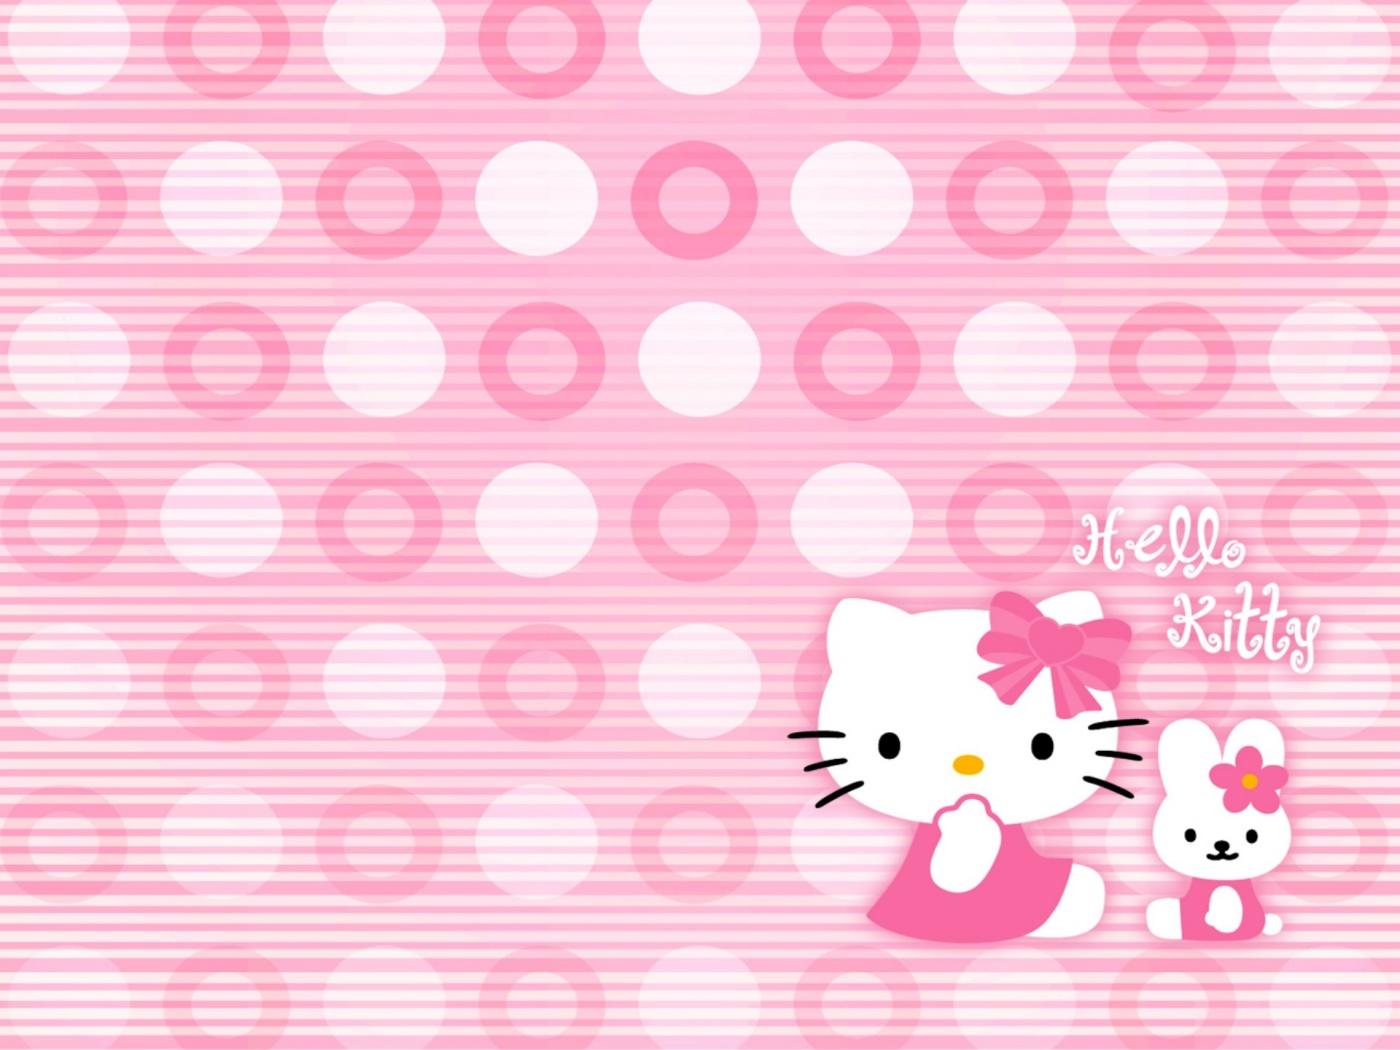 Hello kitty images hello kitty hd wallpaper and background - Wallpaper Hello Kitty Hello Kitty Hd Photo Gavriil Levins 1400x1050 0 299 Mb